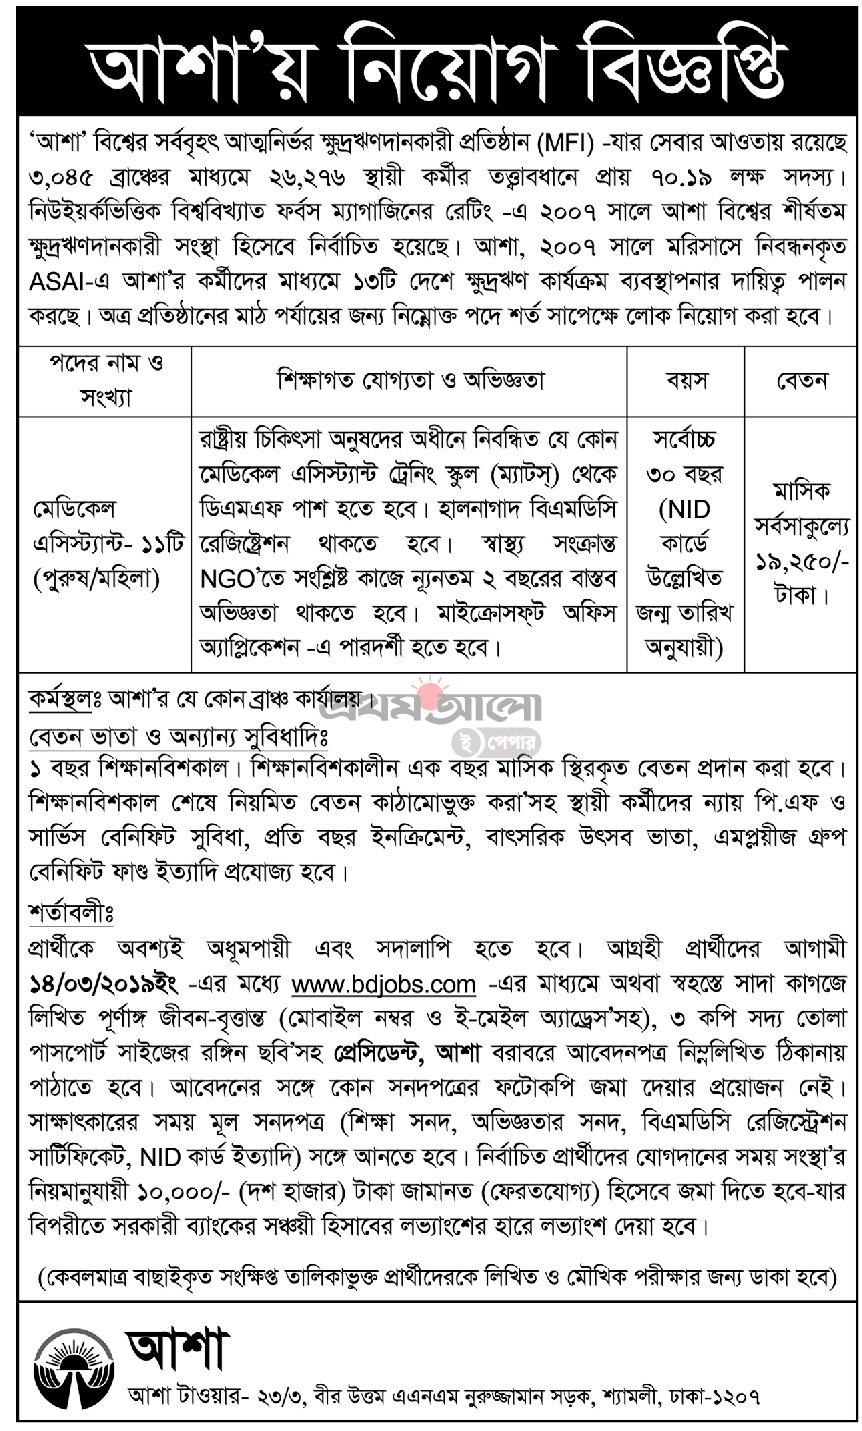 ASA NGO Job Circular-2019 |  ASA এনজিও চাকরি সার্কুলার -2019 | SamTipsBD